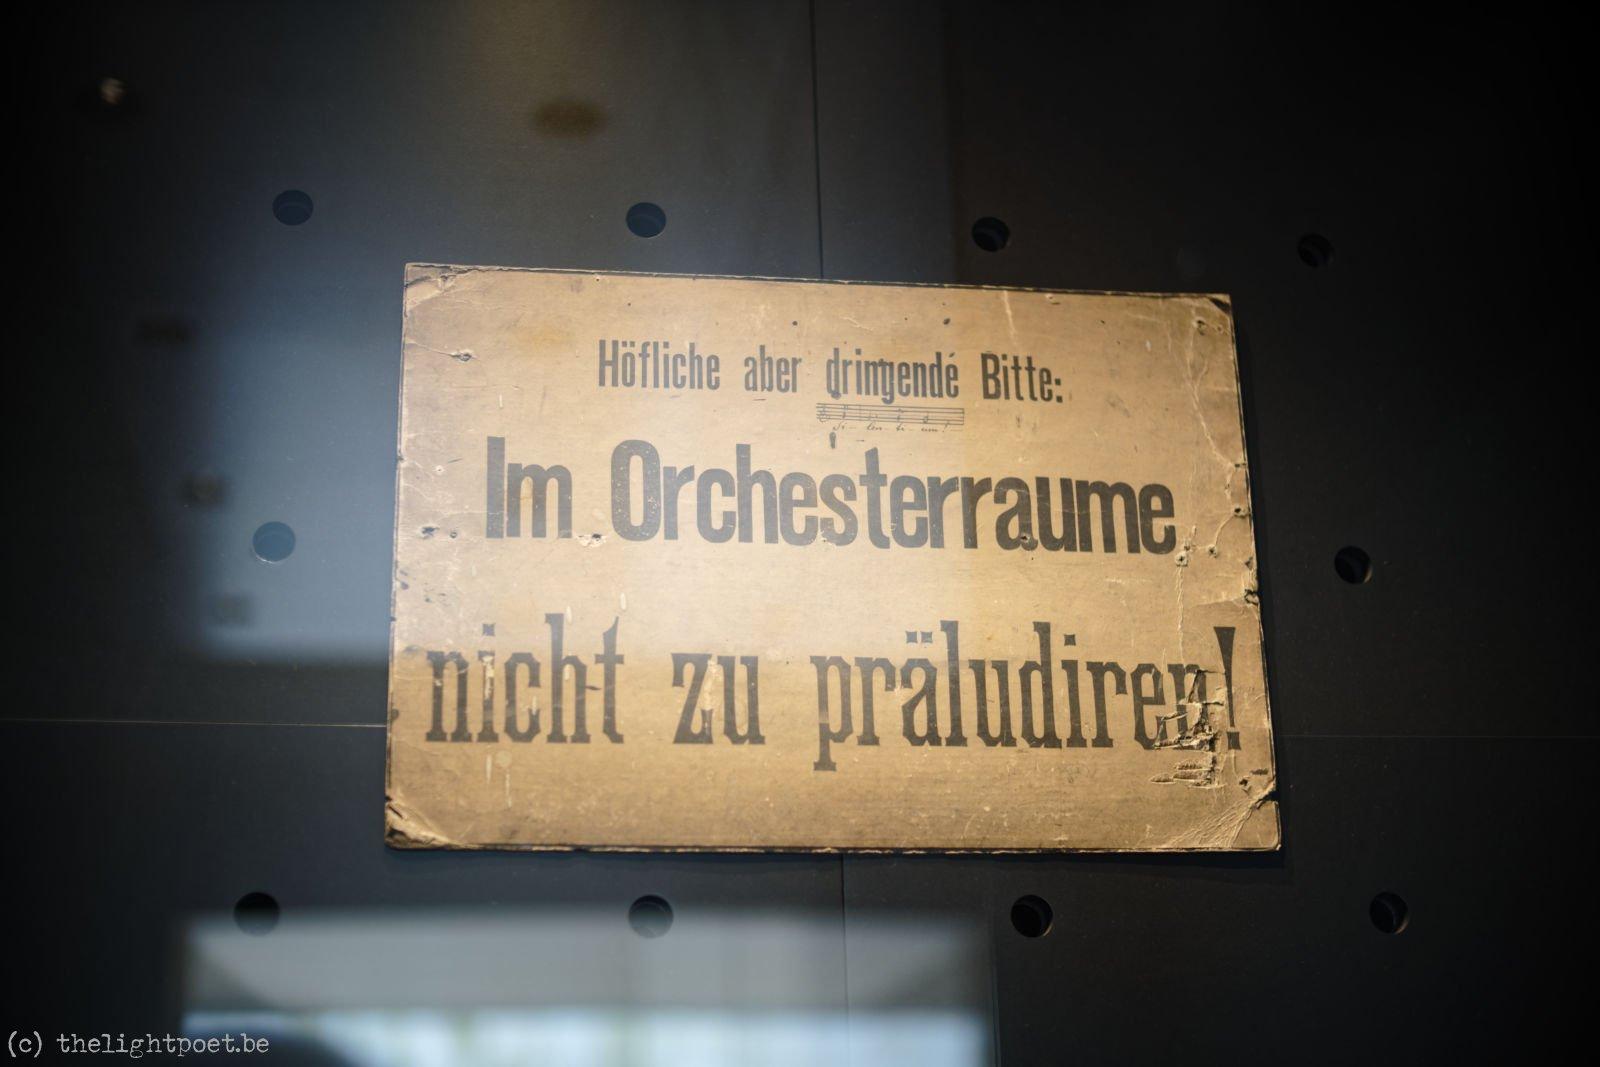 2018_07_Bayreuth_20180716_140140_DxO_PL1_1600px